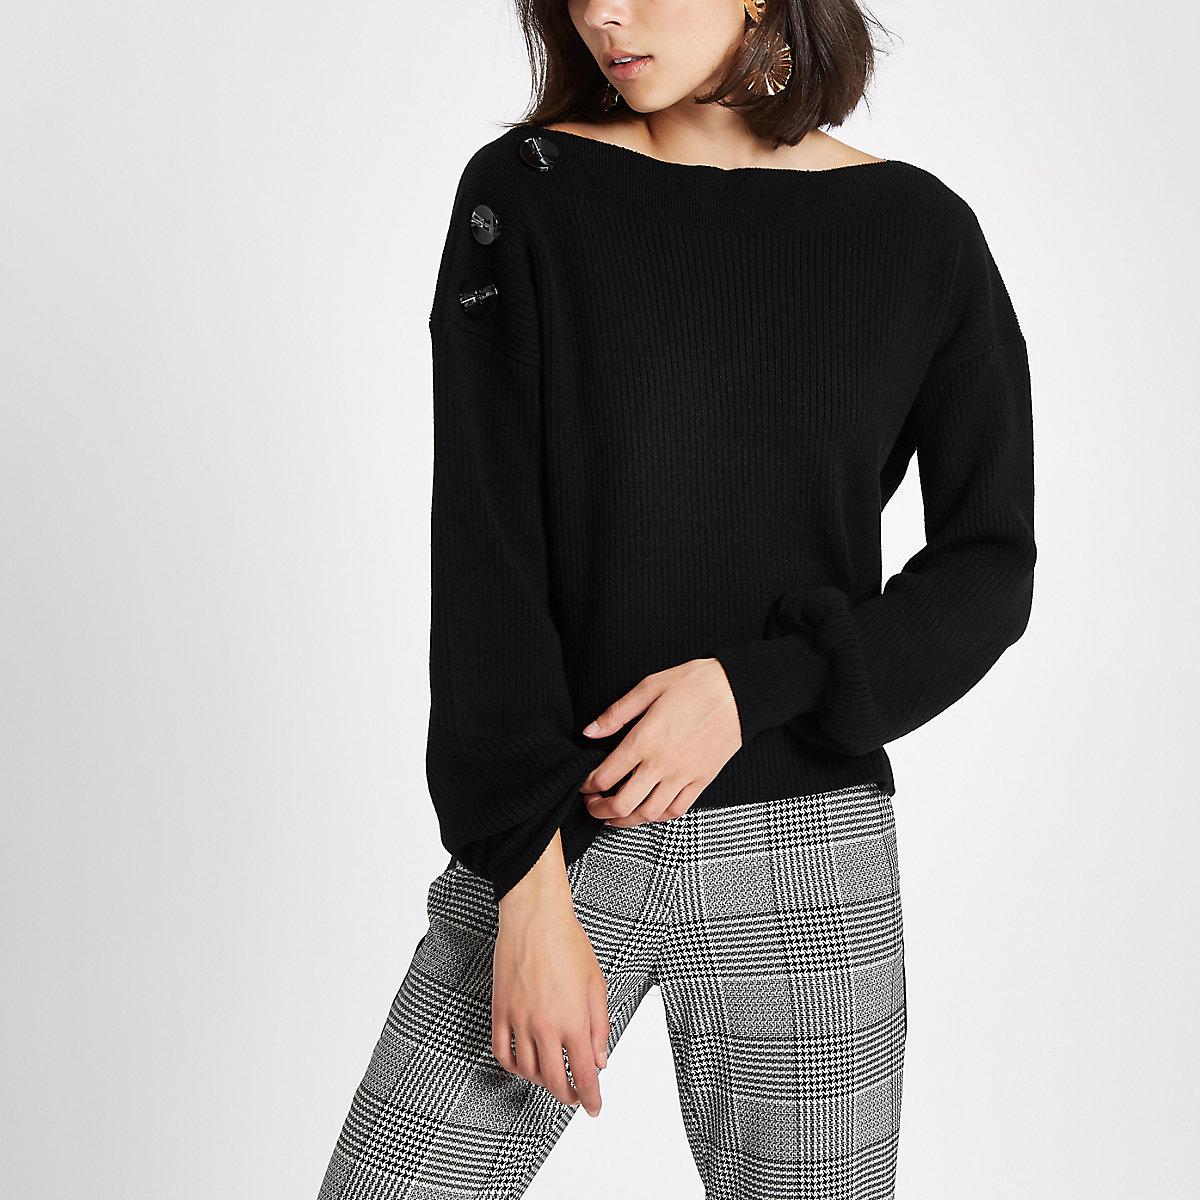 online store 9fd05 eccca Black rib knit button shoulder jumper